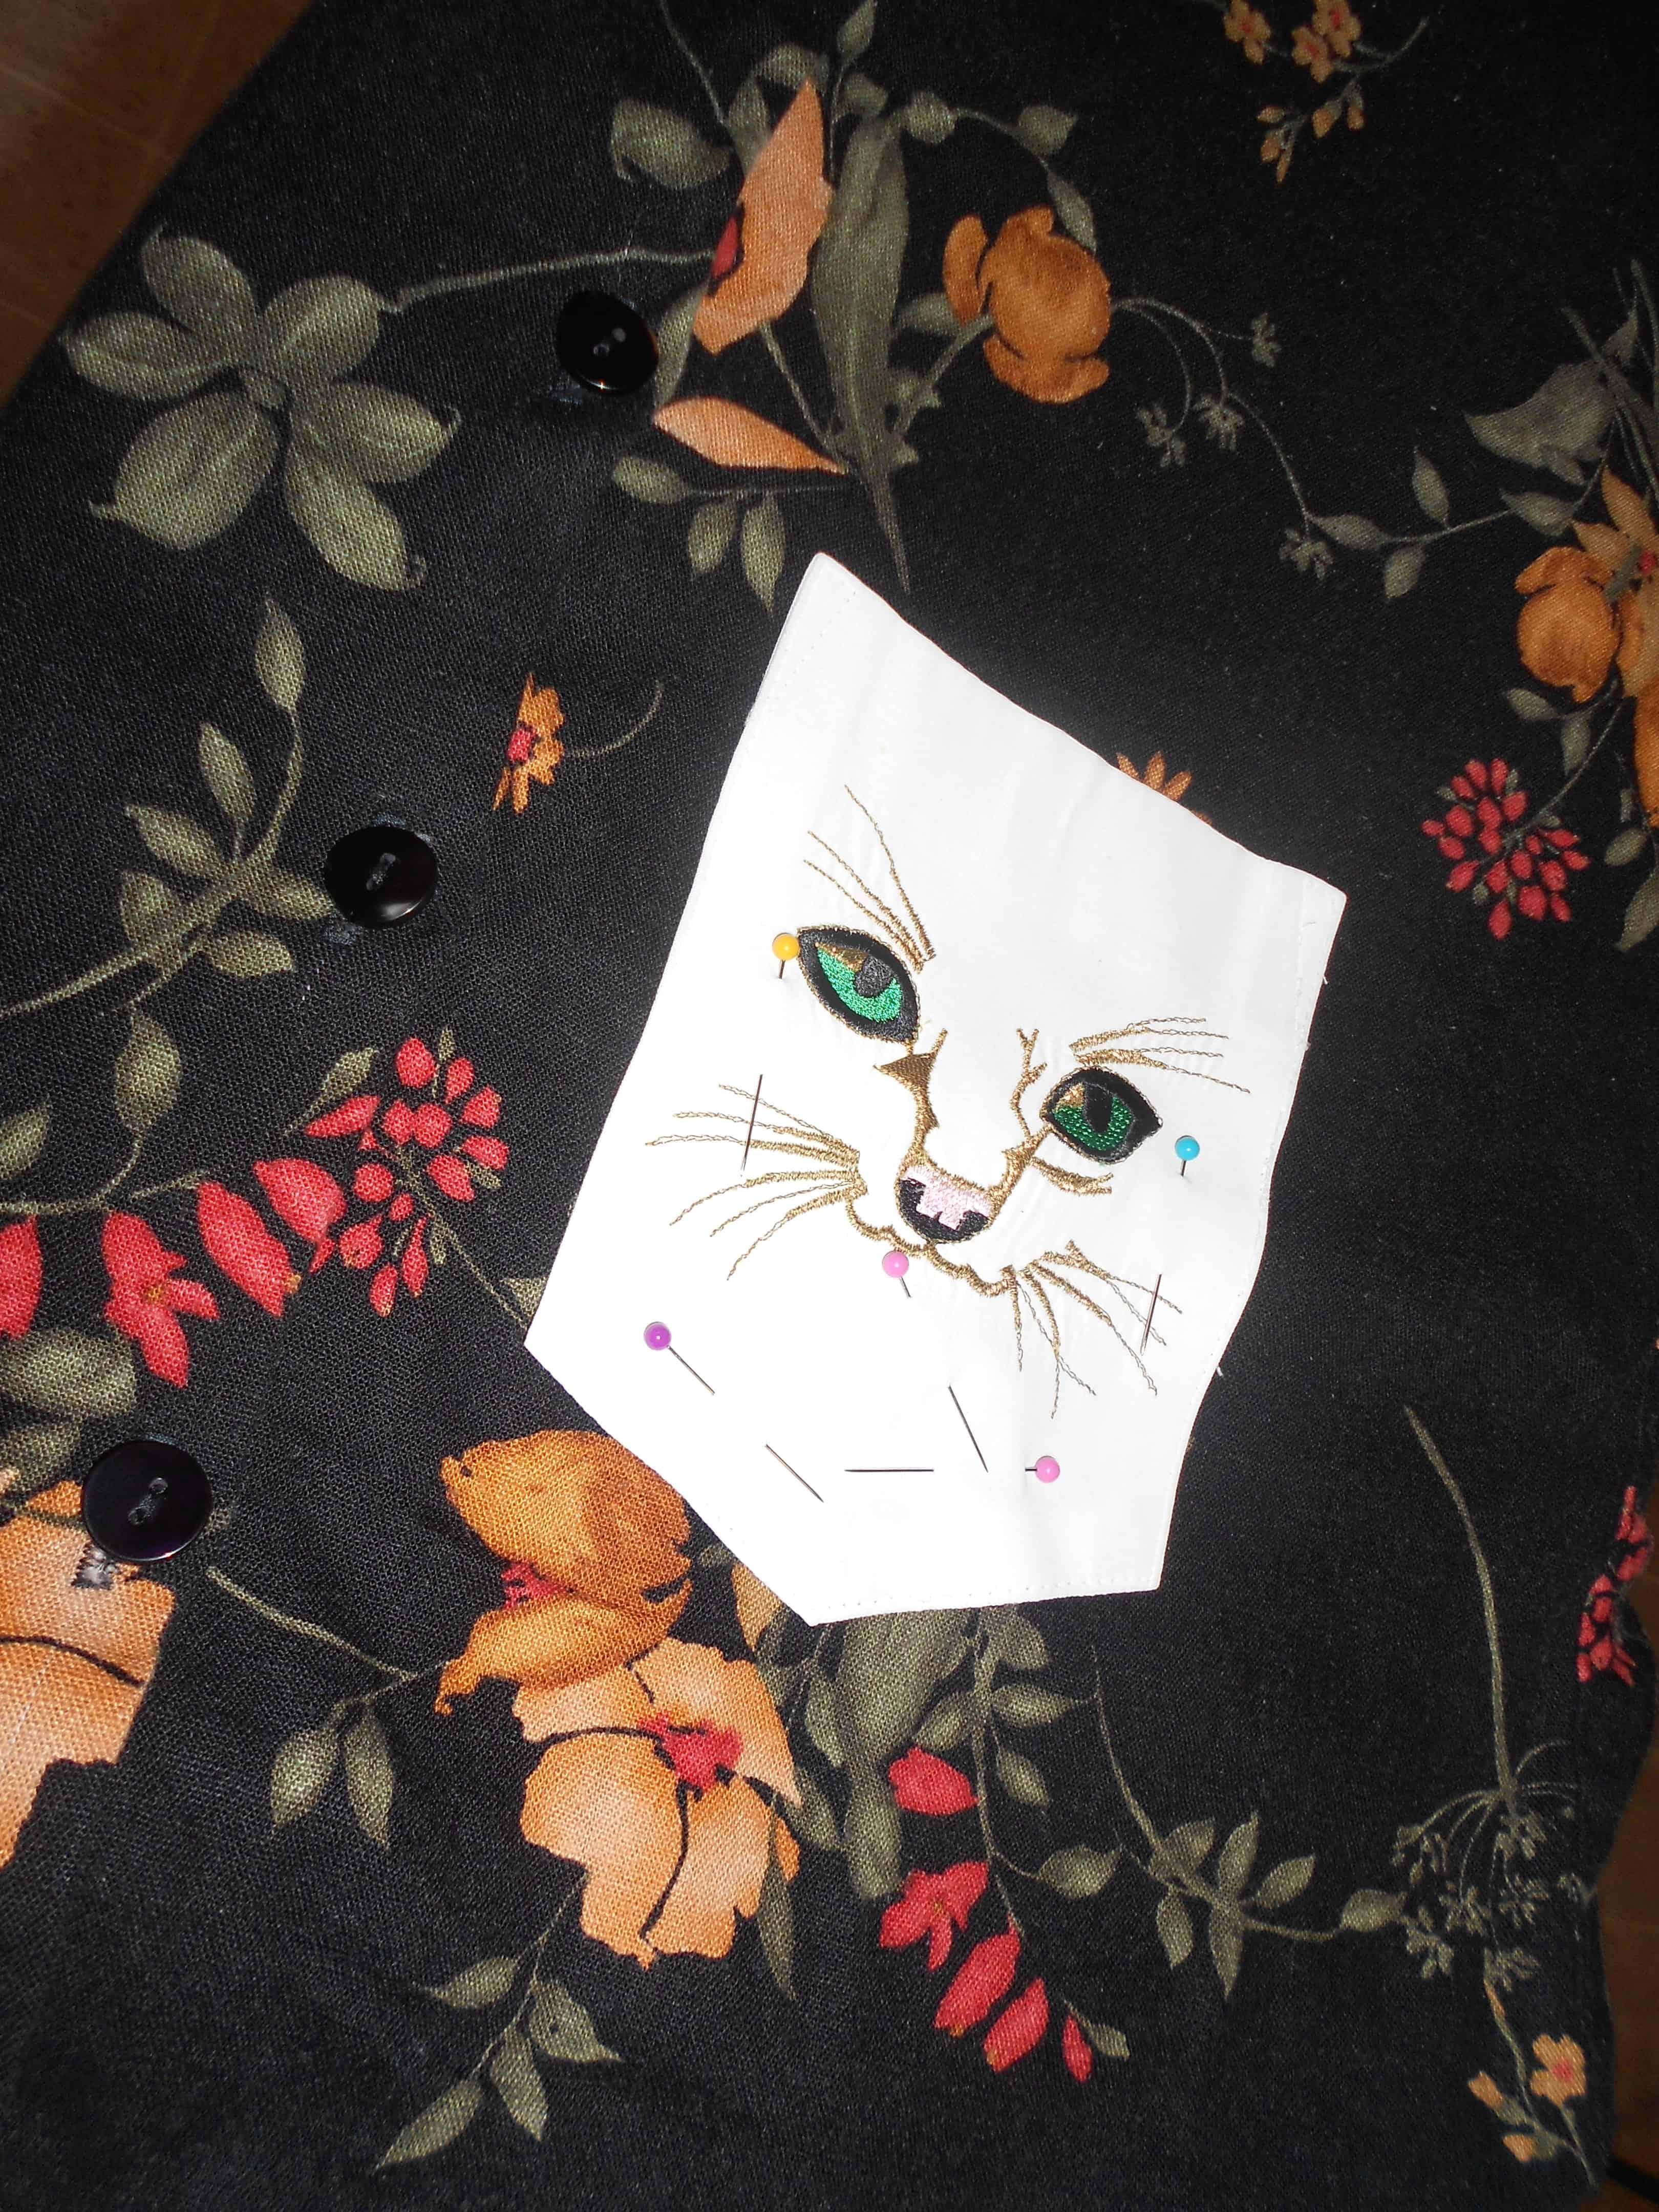 cat pocket pinned to bottom of dress